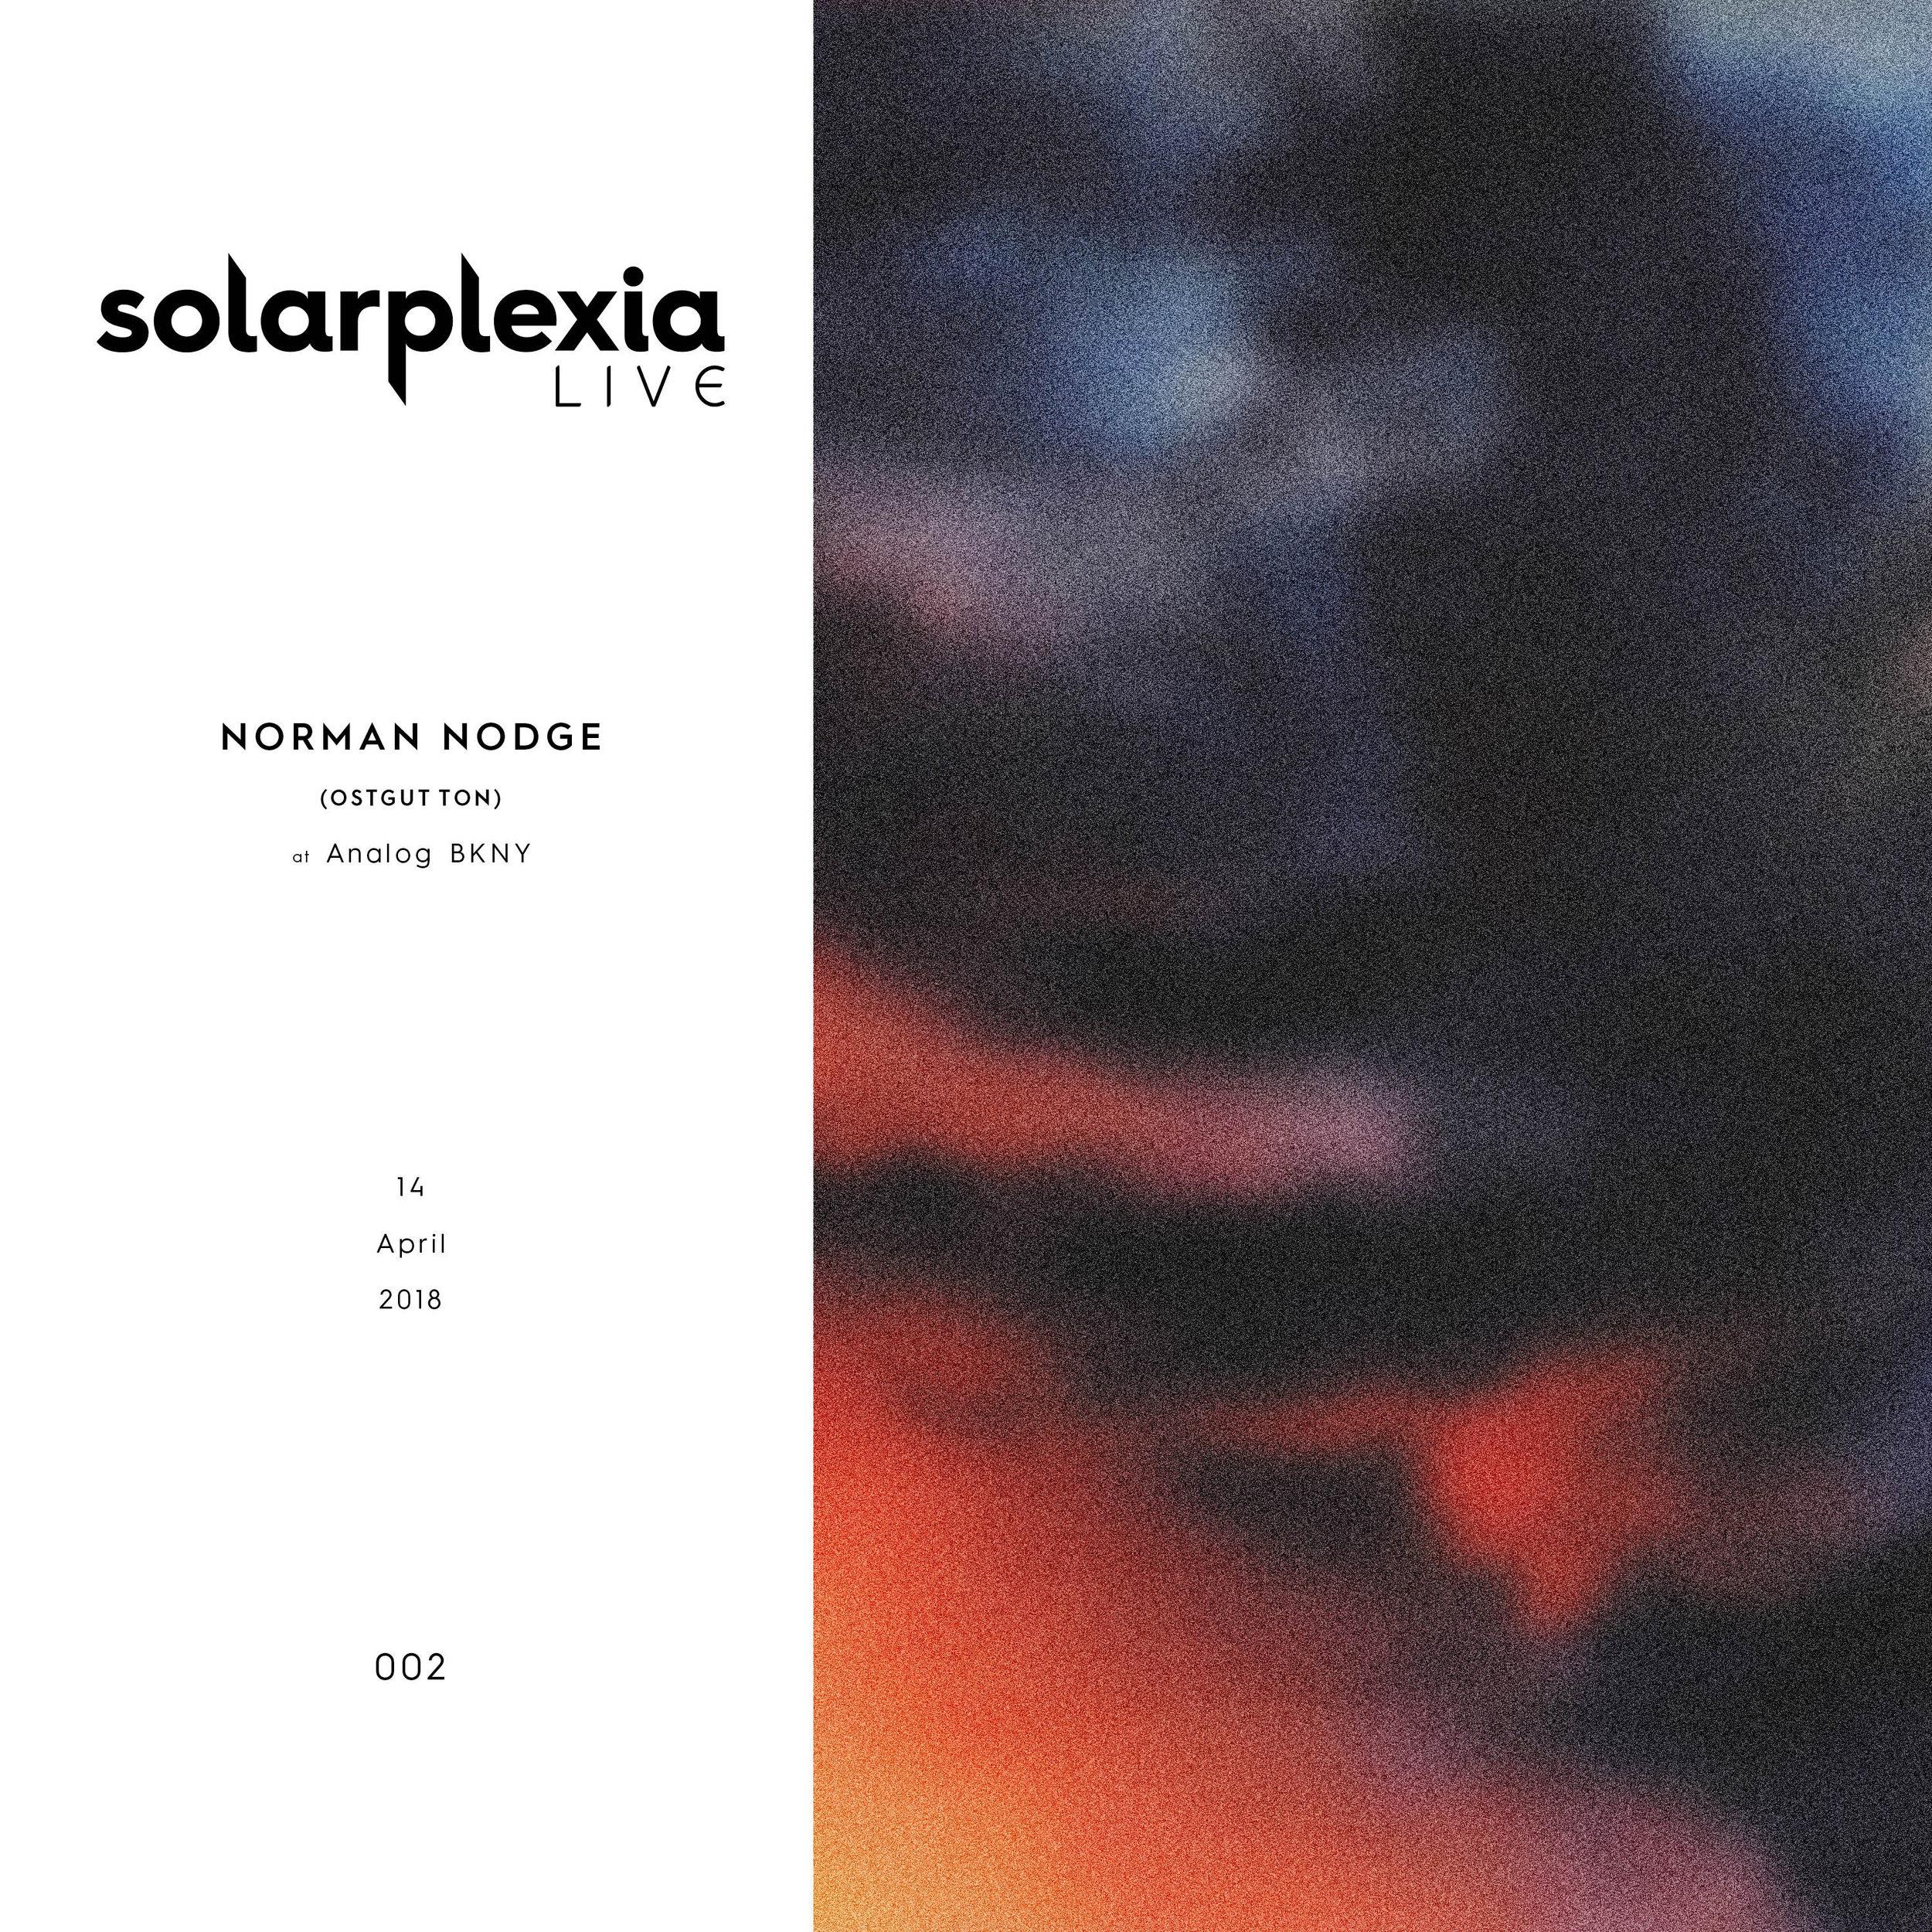 Solarplexia_Live-Nodge-2.jpg